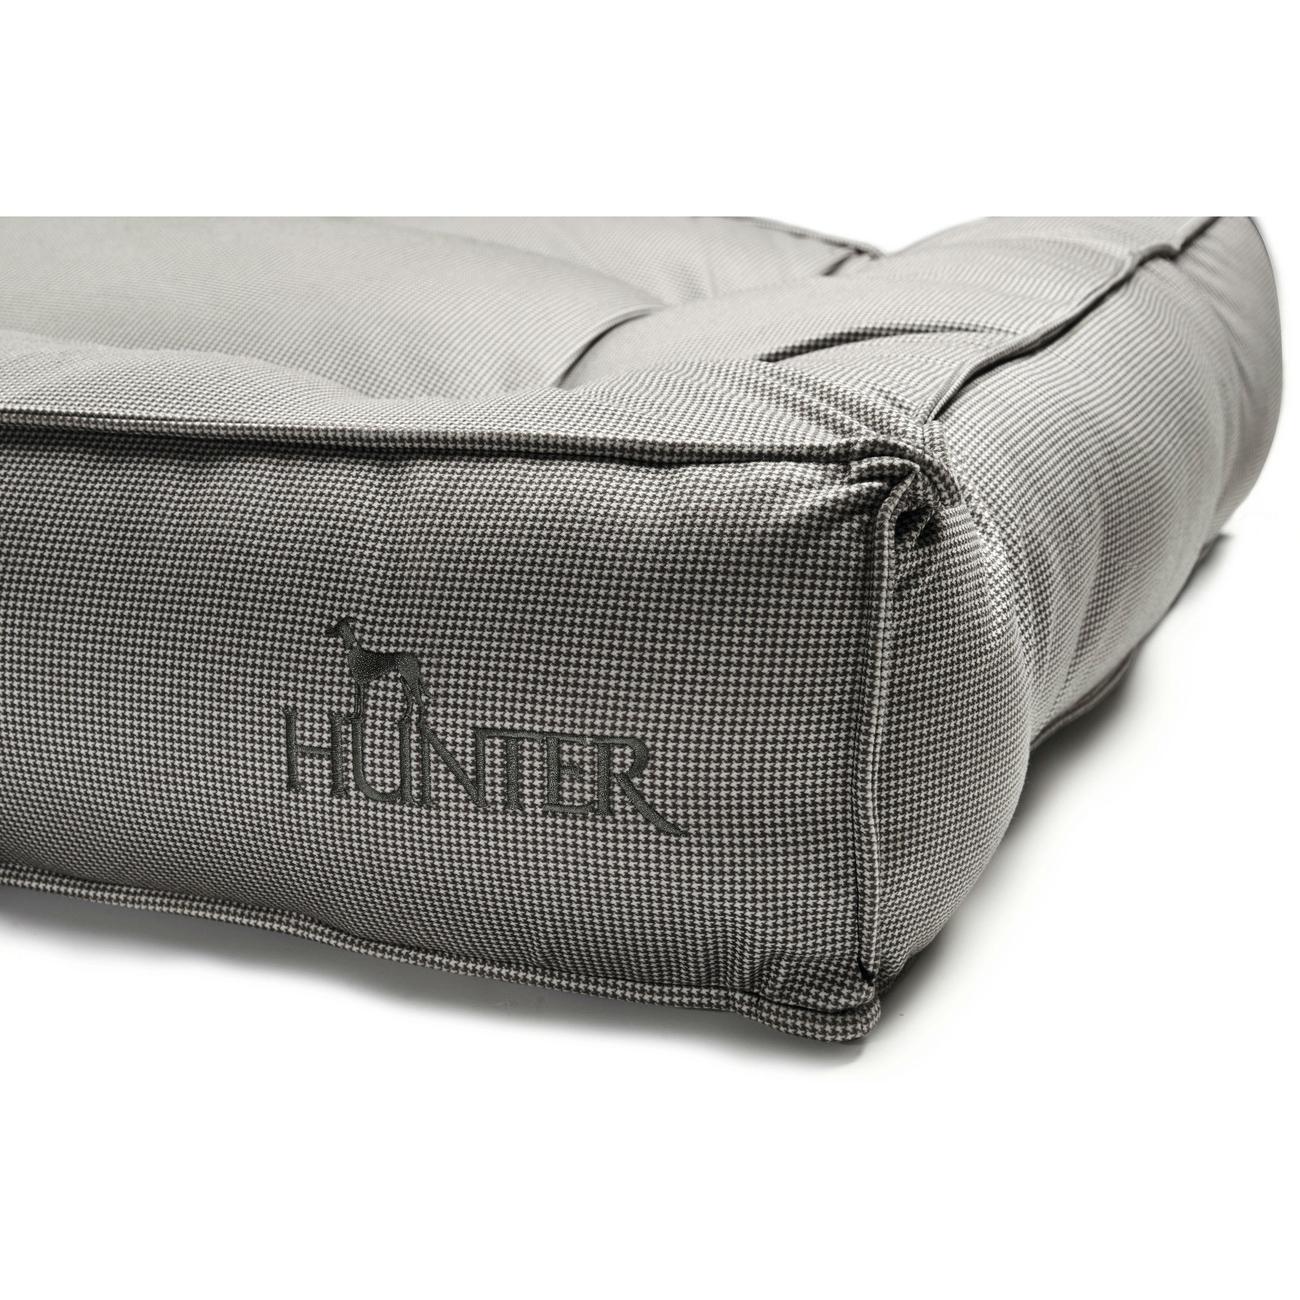 Hunter Hundebett Lancaster 65057, Bild 6